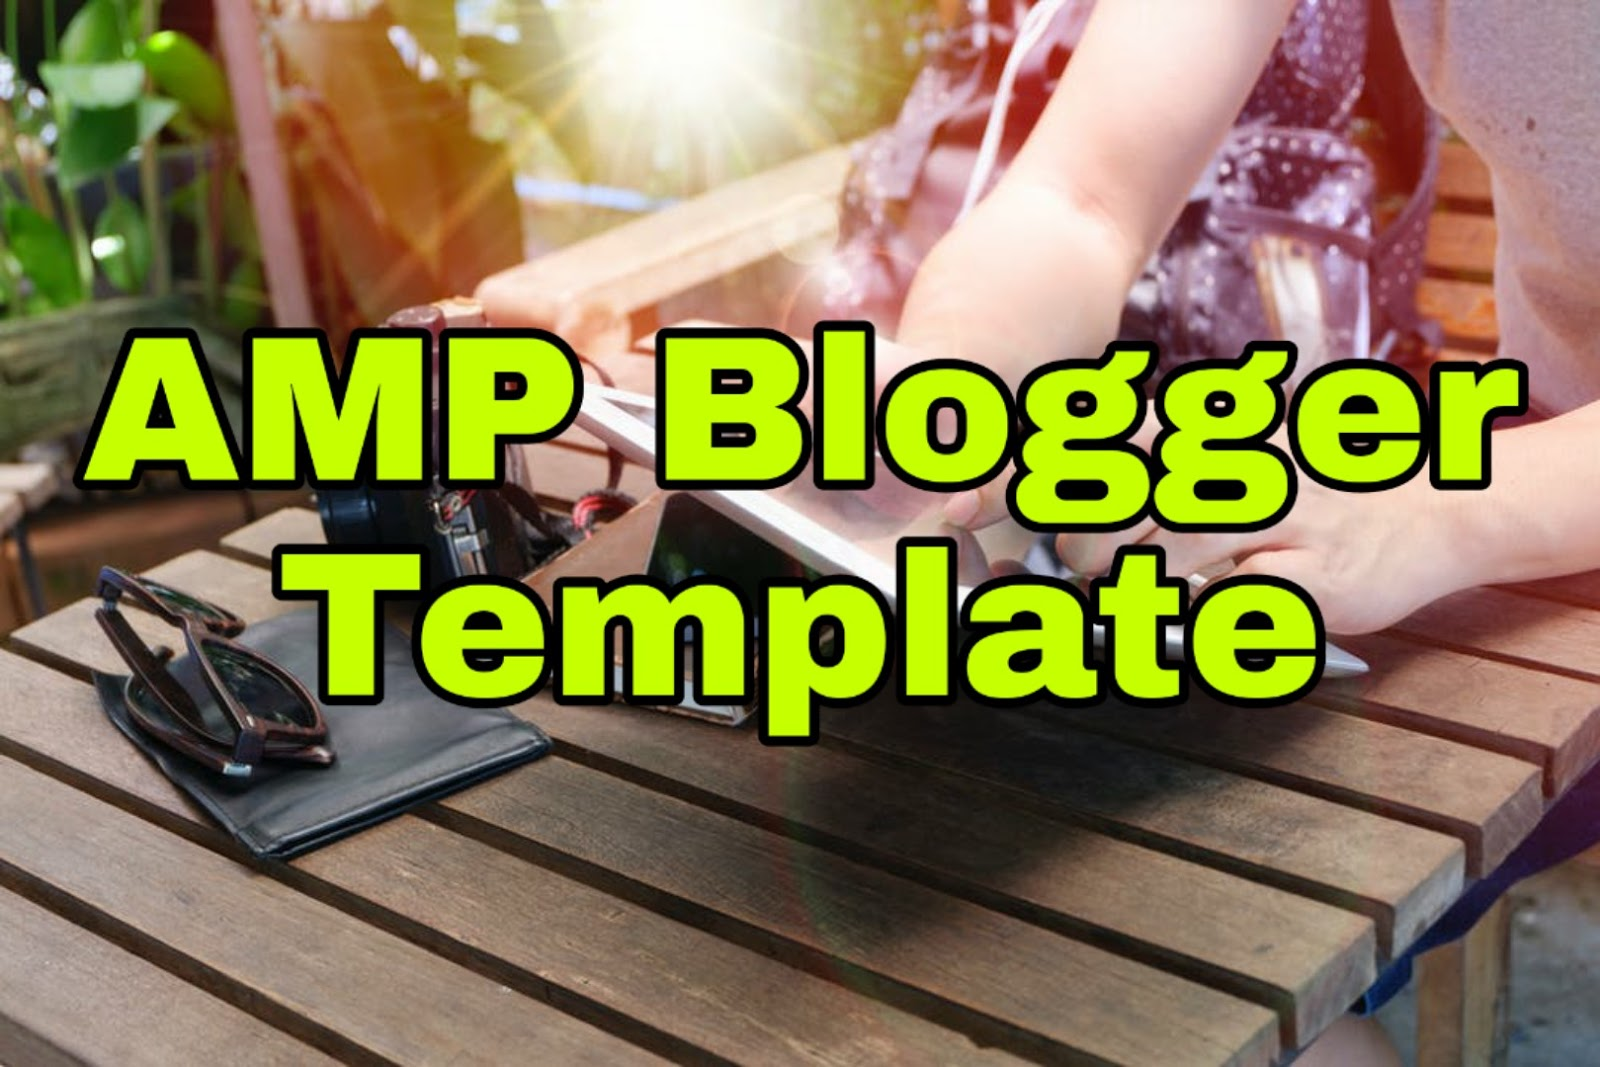 Top 5 Google AMP Blogger Template 2019 - SEO Friendly